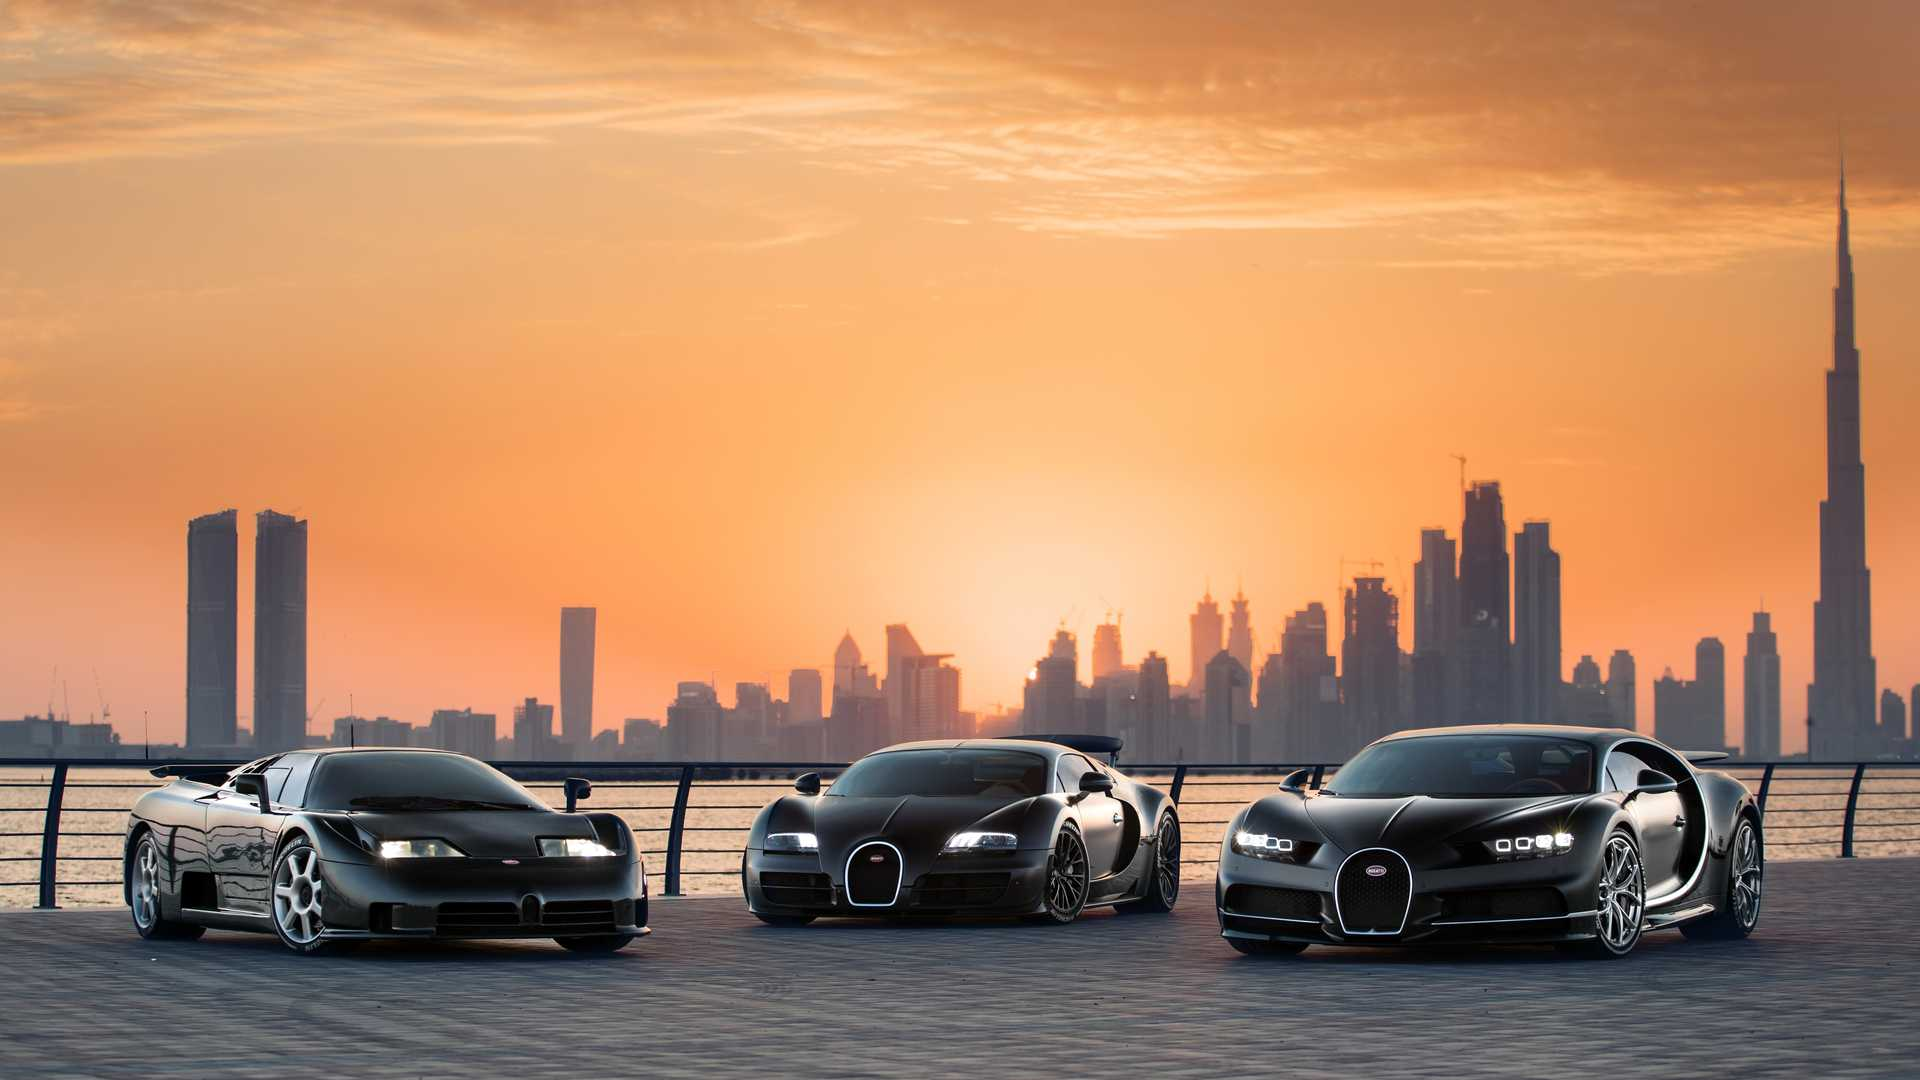 Bugatti Chiron, Veyron, and EB110 In Dubai